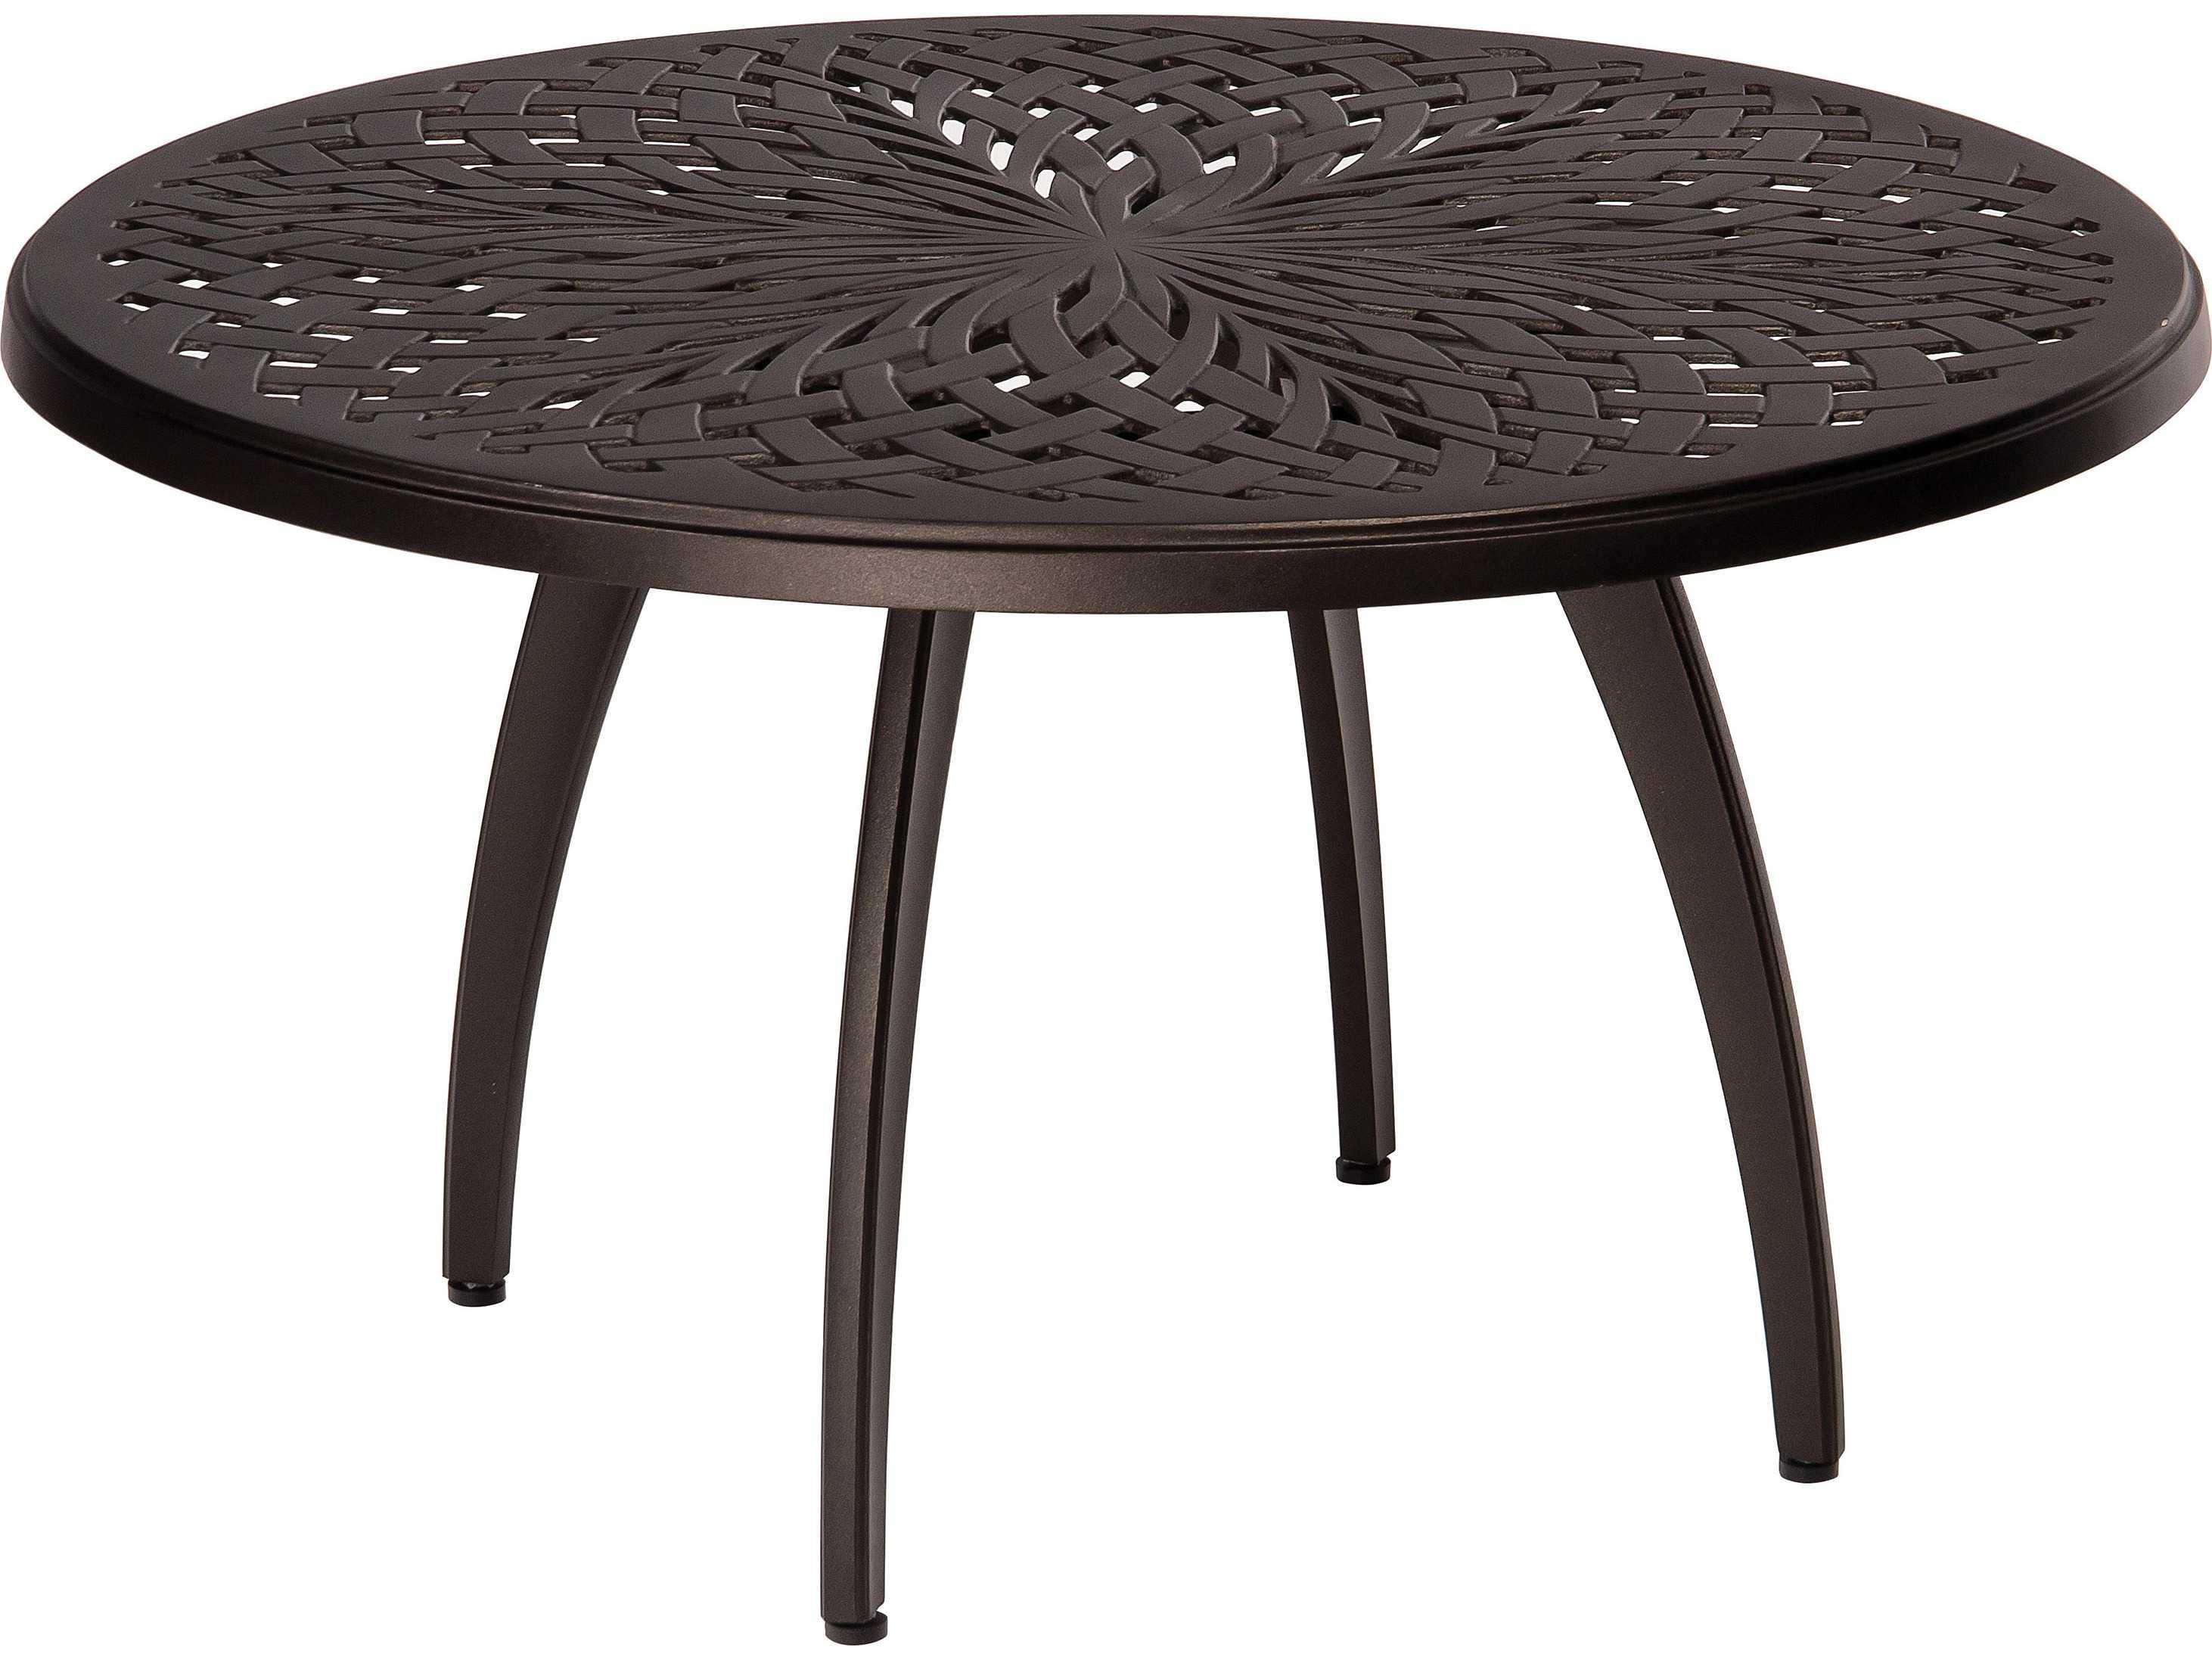 Woodard Apollo Aluminum 36 Round Coffee Table 7u54bt